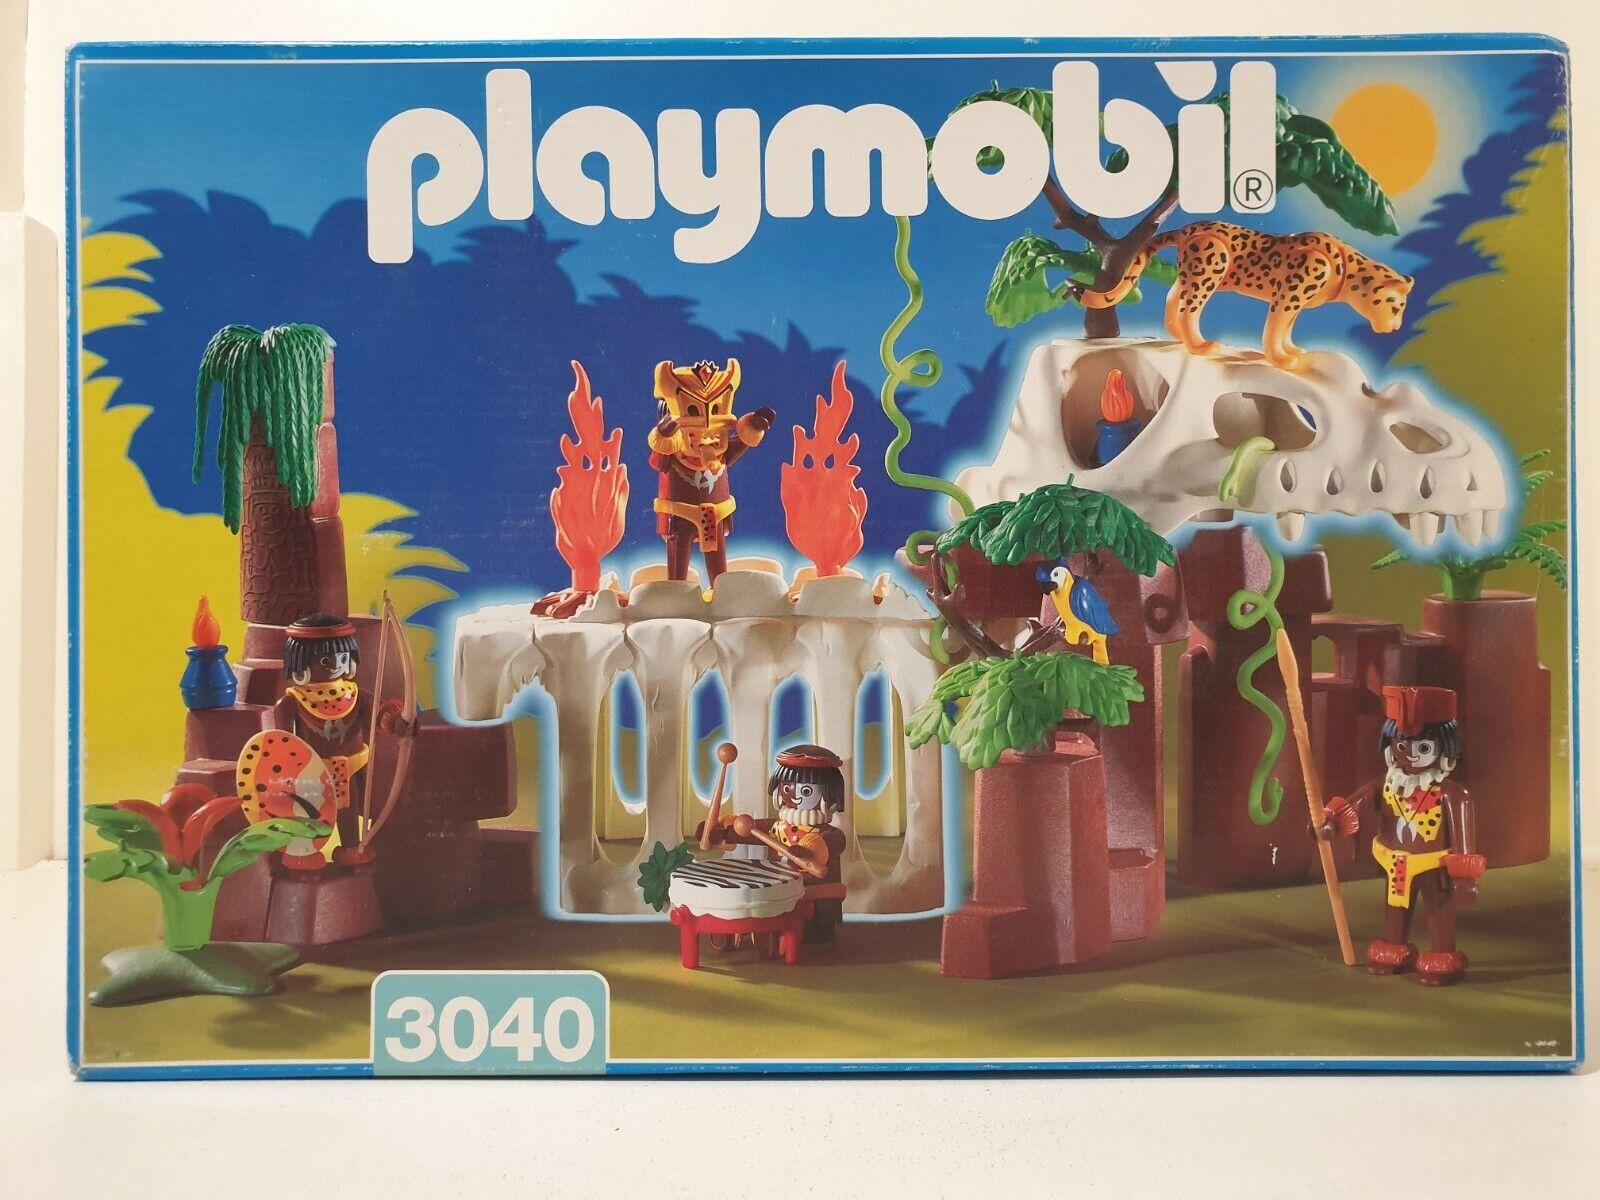 Playmobil   3040 indigen dinosaur skeleton vintage 1998 complete with instructions